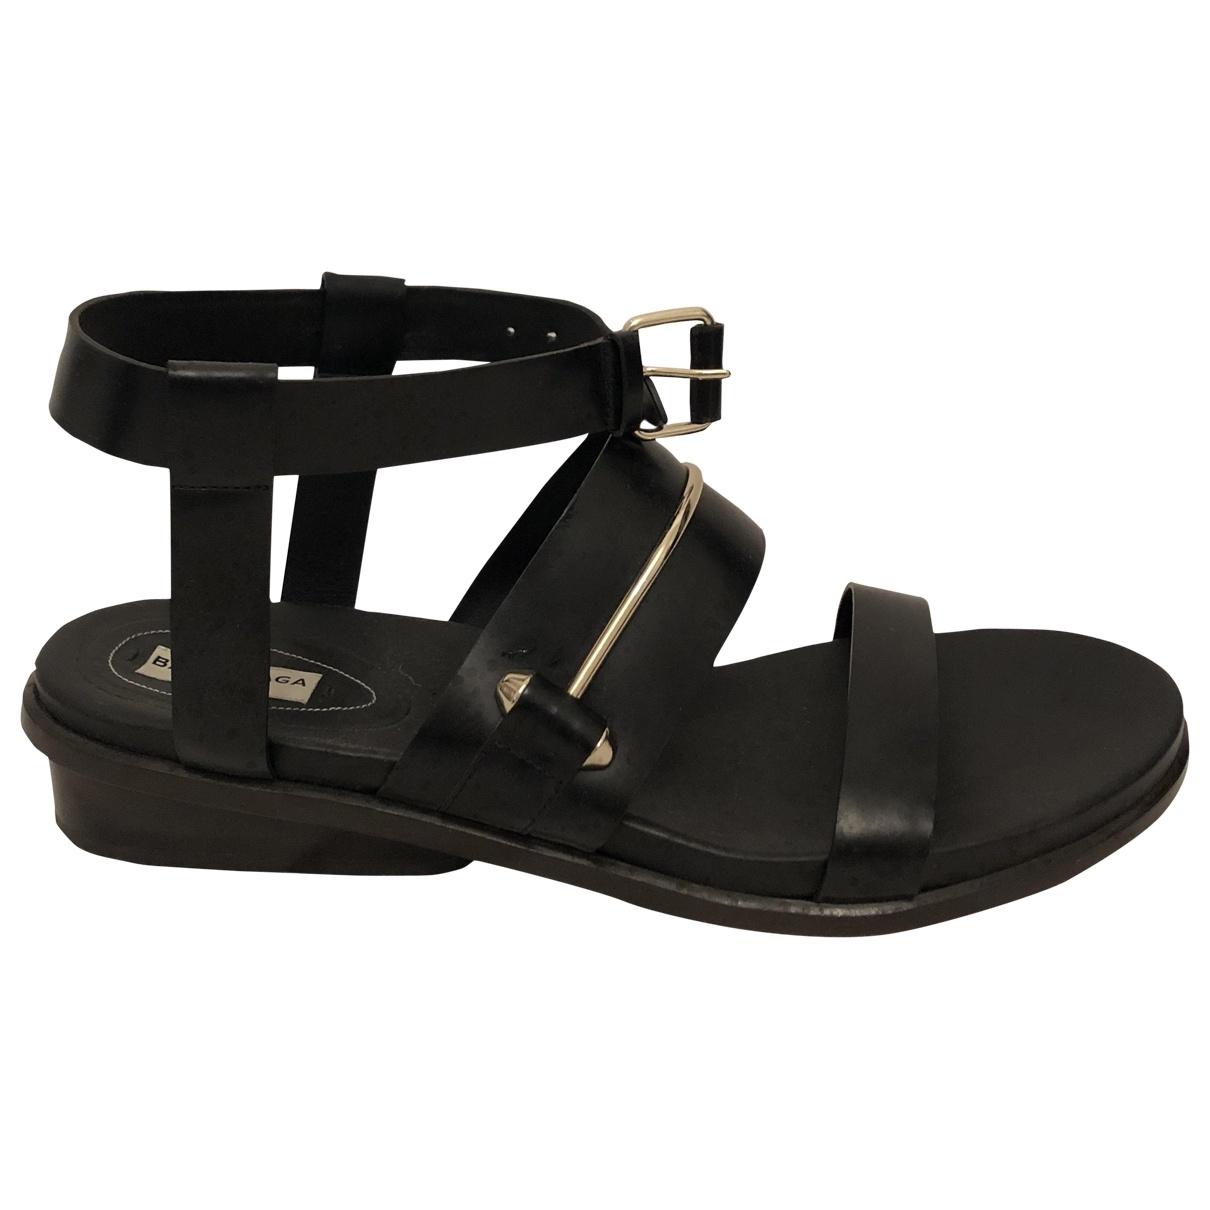 Balenciaga \N Black Leather Sandals for Women 41.5 EU